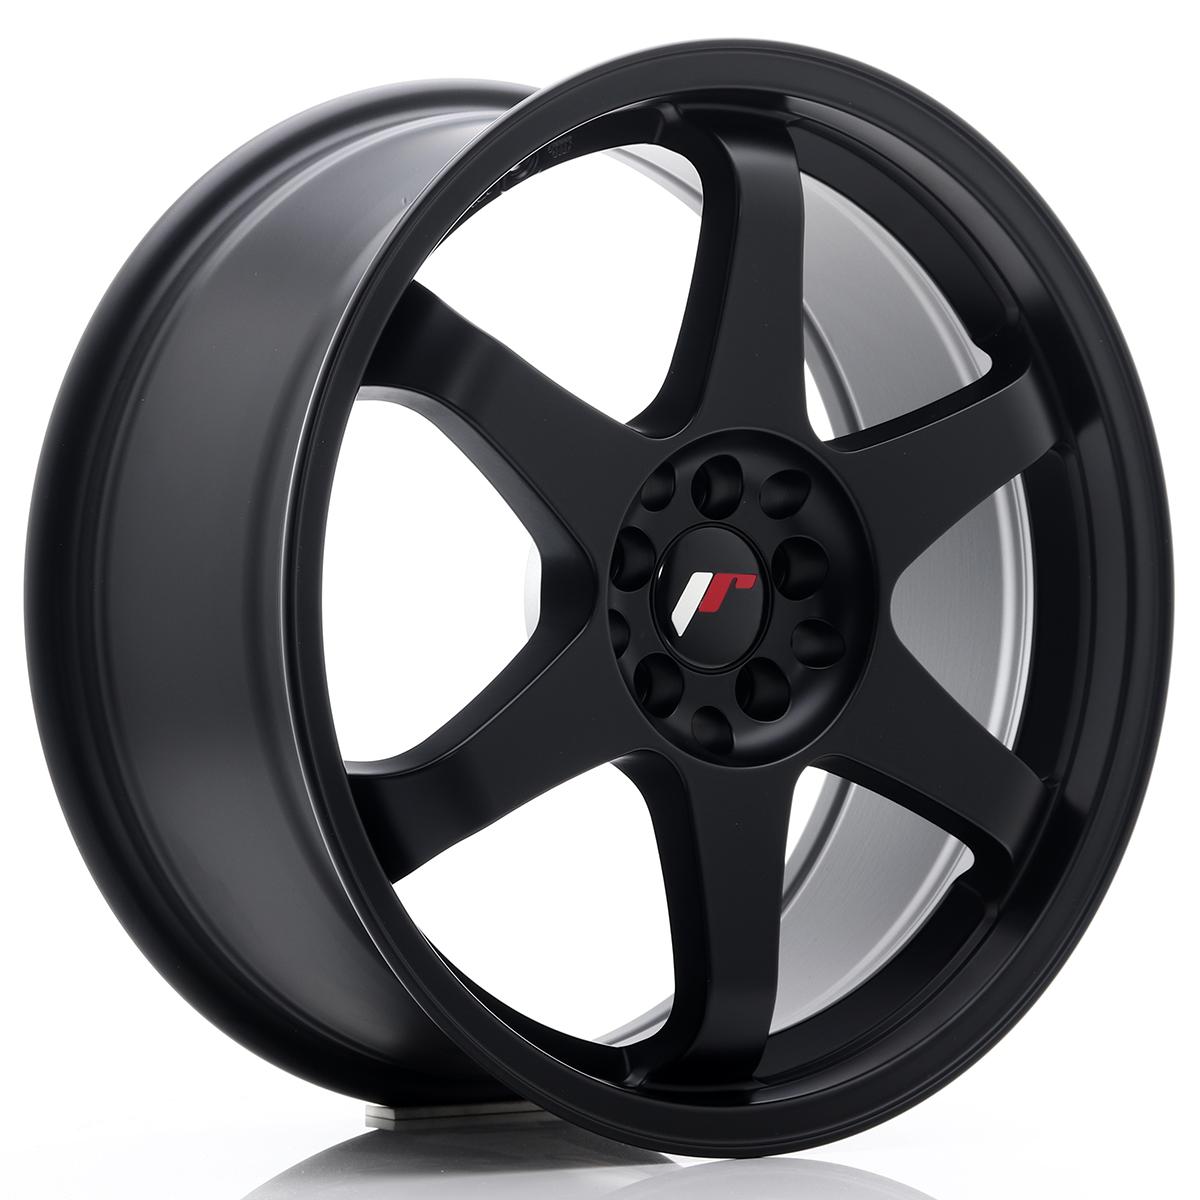 JR Wheels JR3 18x8 ET35 5x100/120 Matt Black